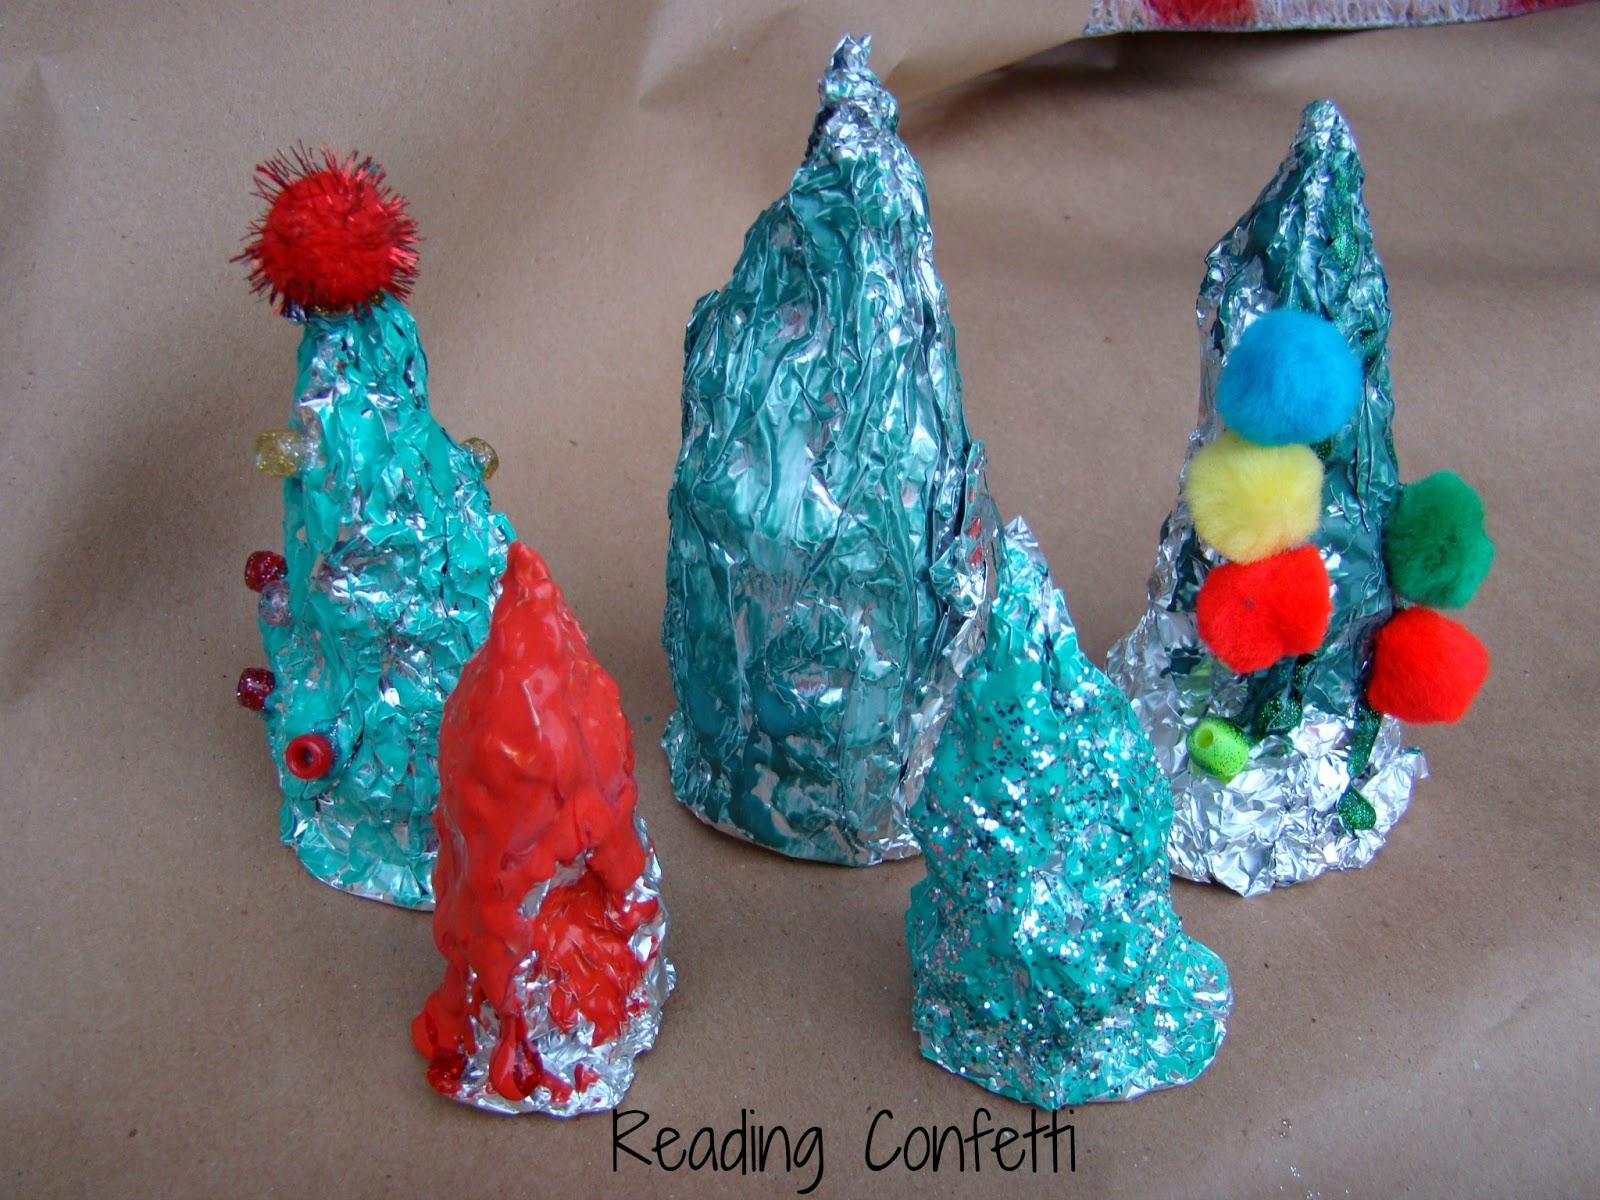 Tin Foil Christmas Tree Sculptures ~ Reading Confetti